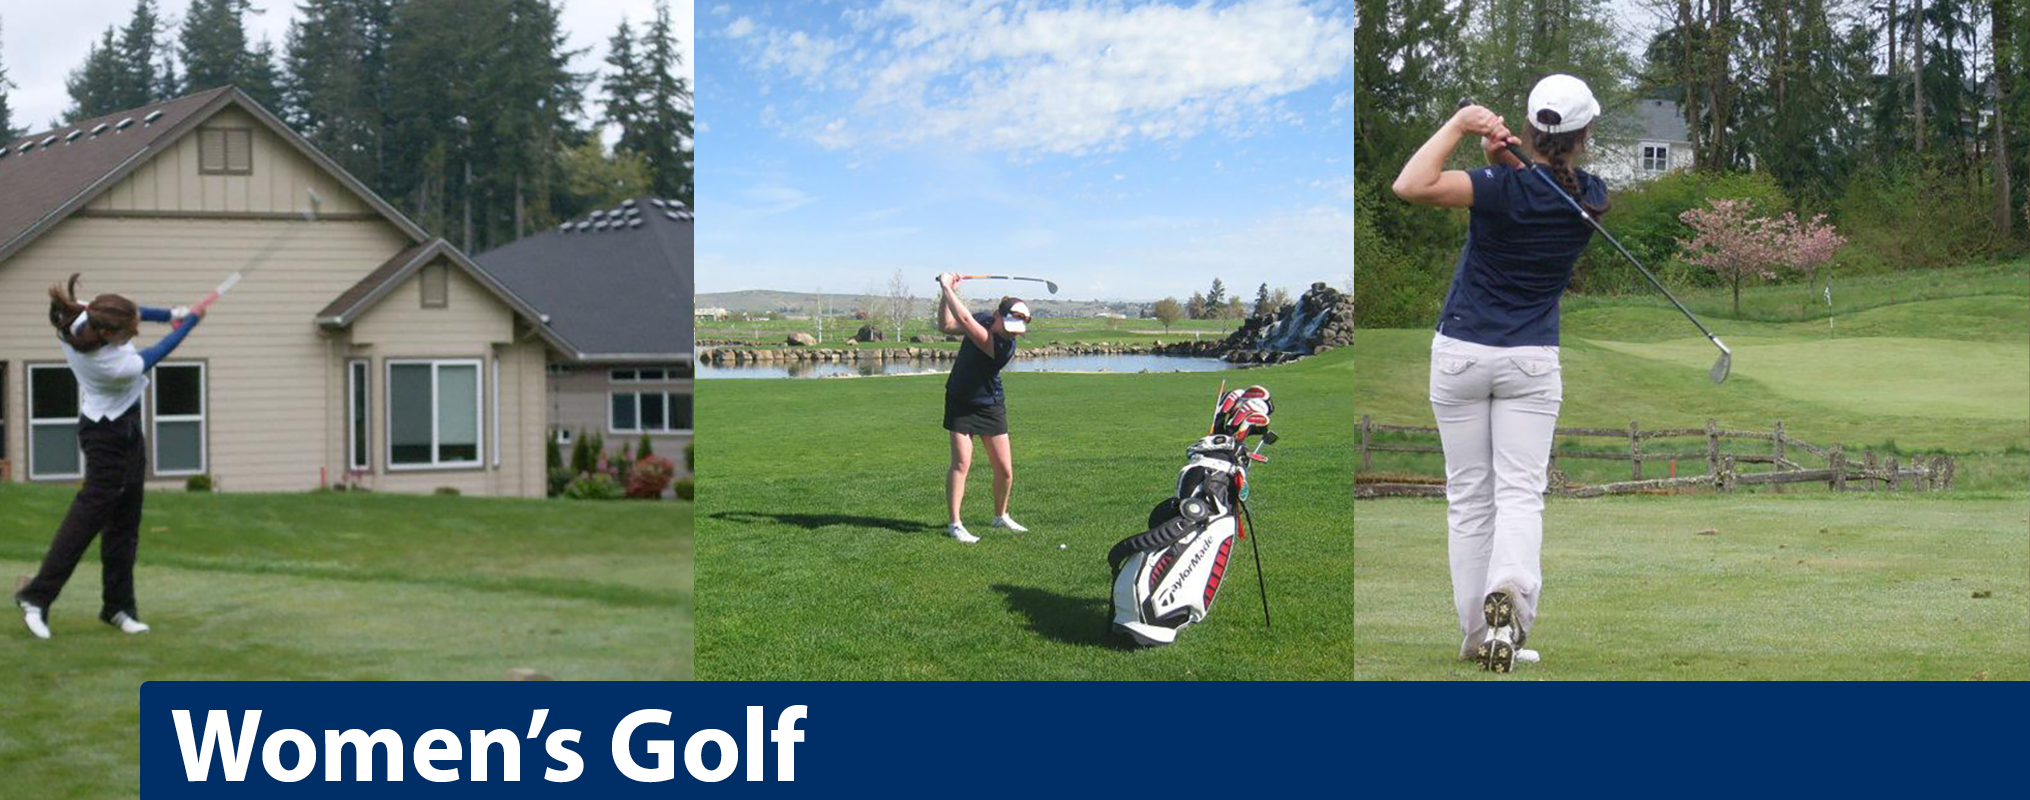 Women's Golf banner image